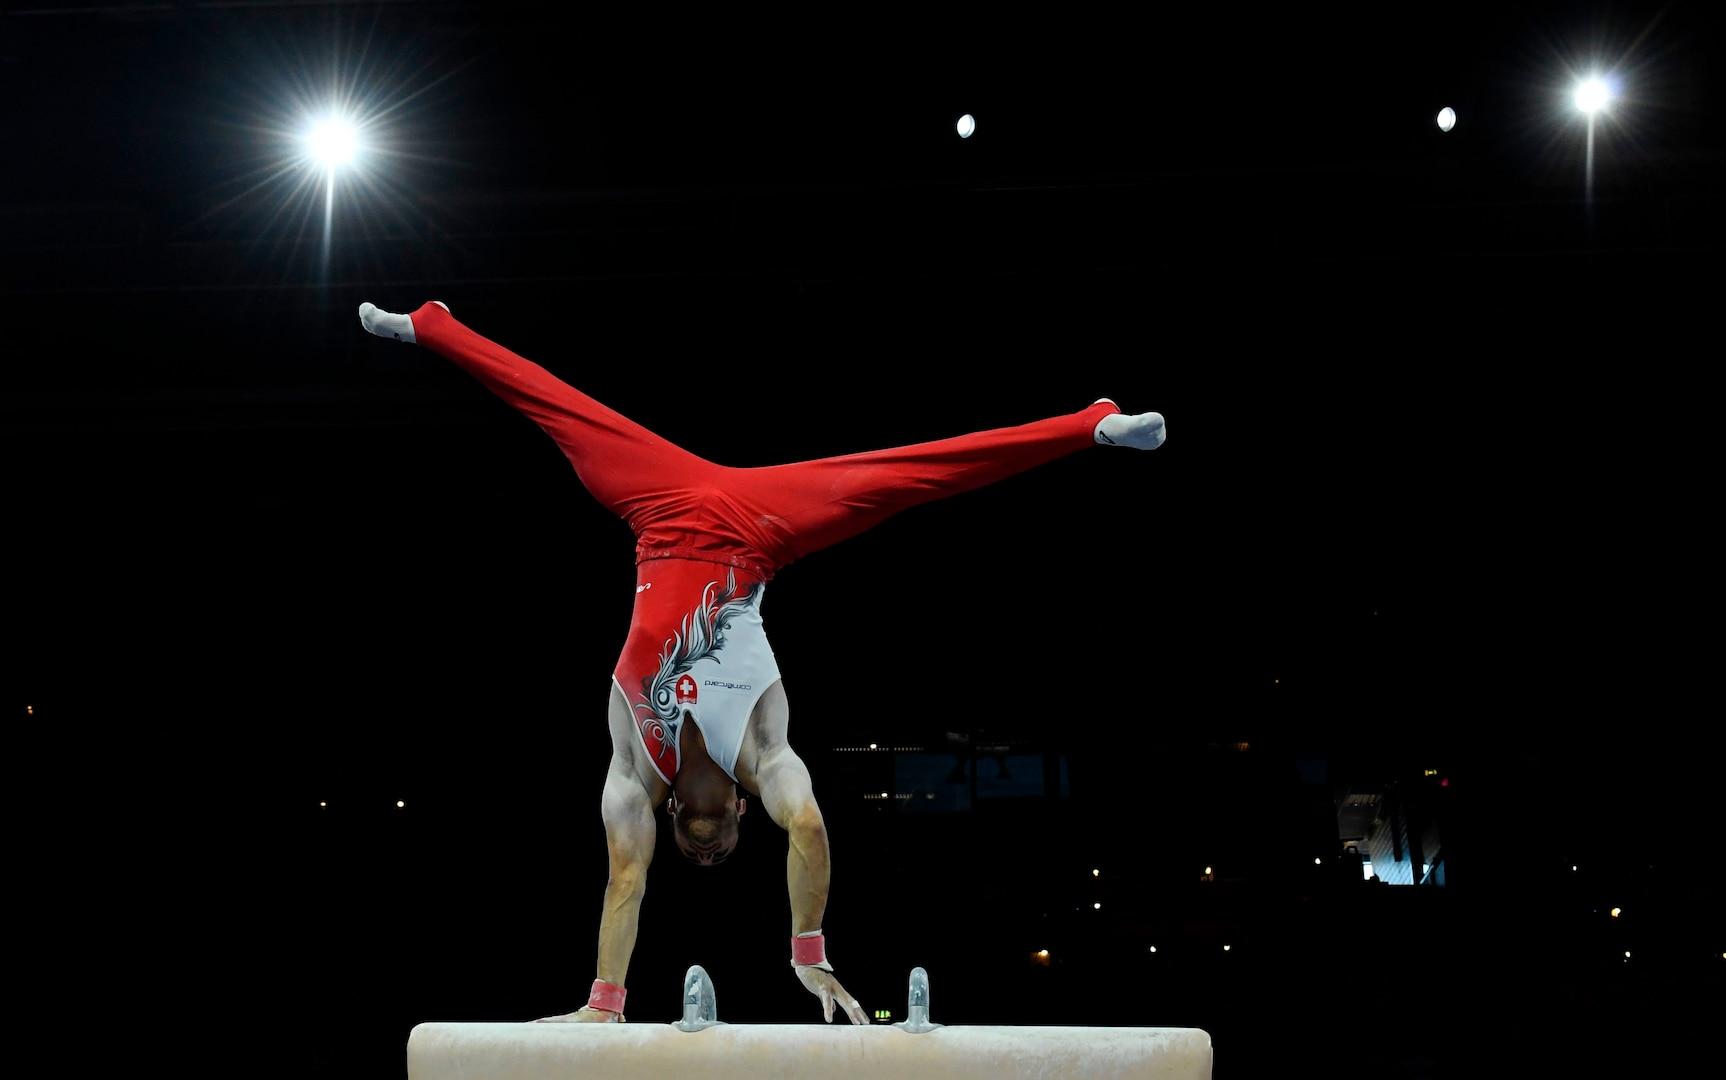 A gymnast performs on pommel horse.